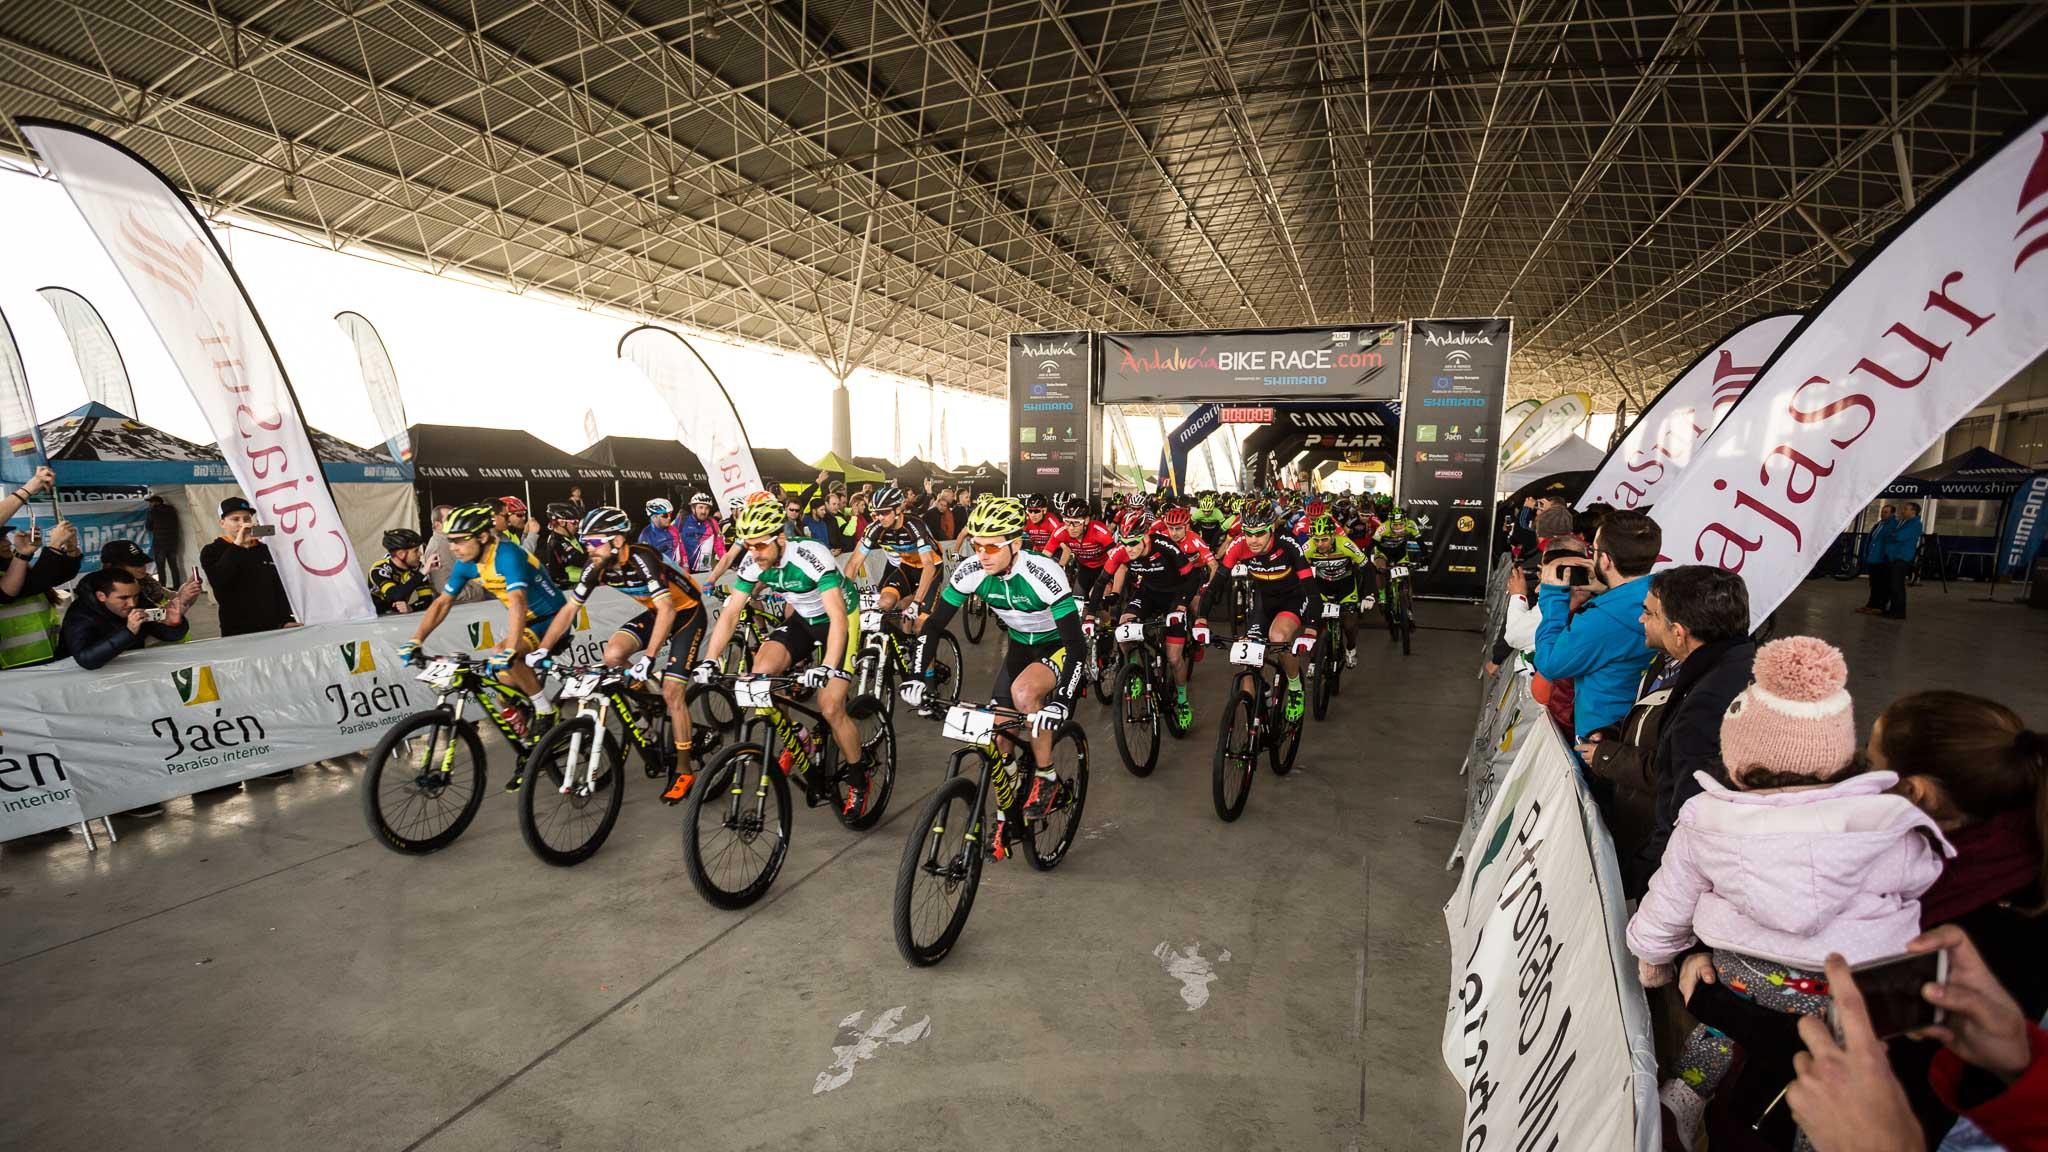 20160222-Andalucia-Bike-Race-2016-B29B9844